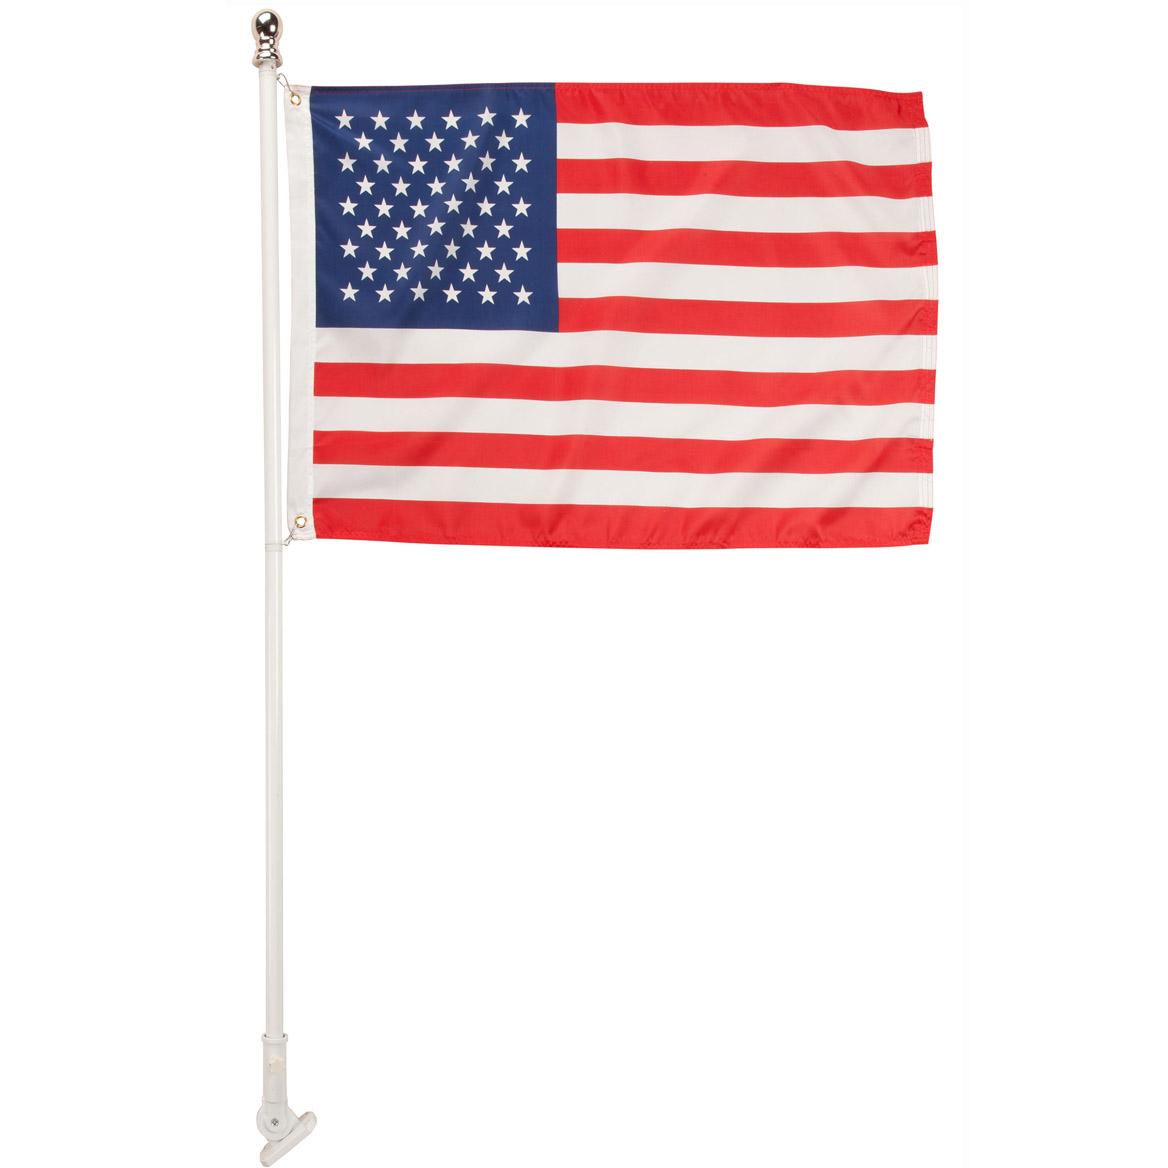 Tangle Free Flag Pole with Flag-348288